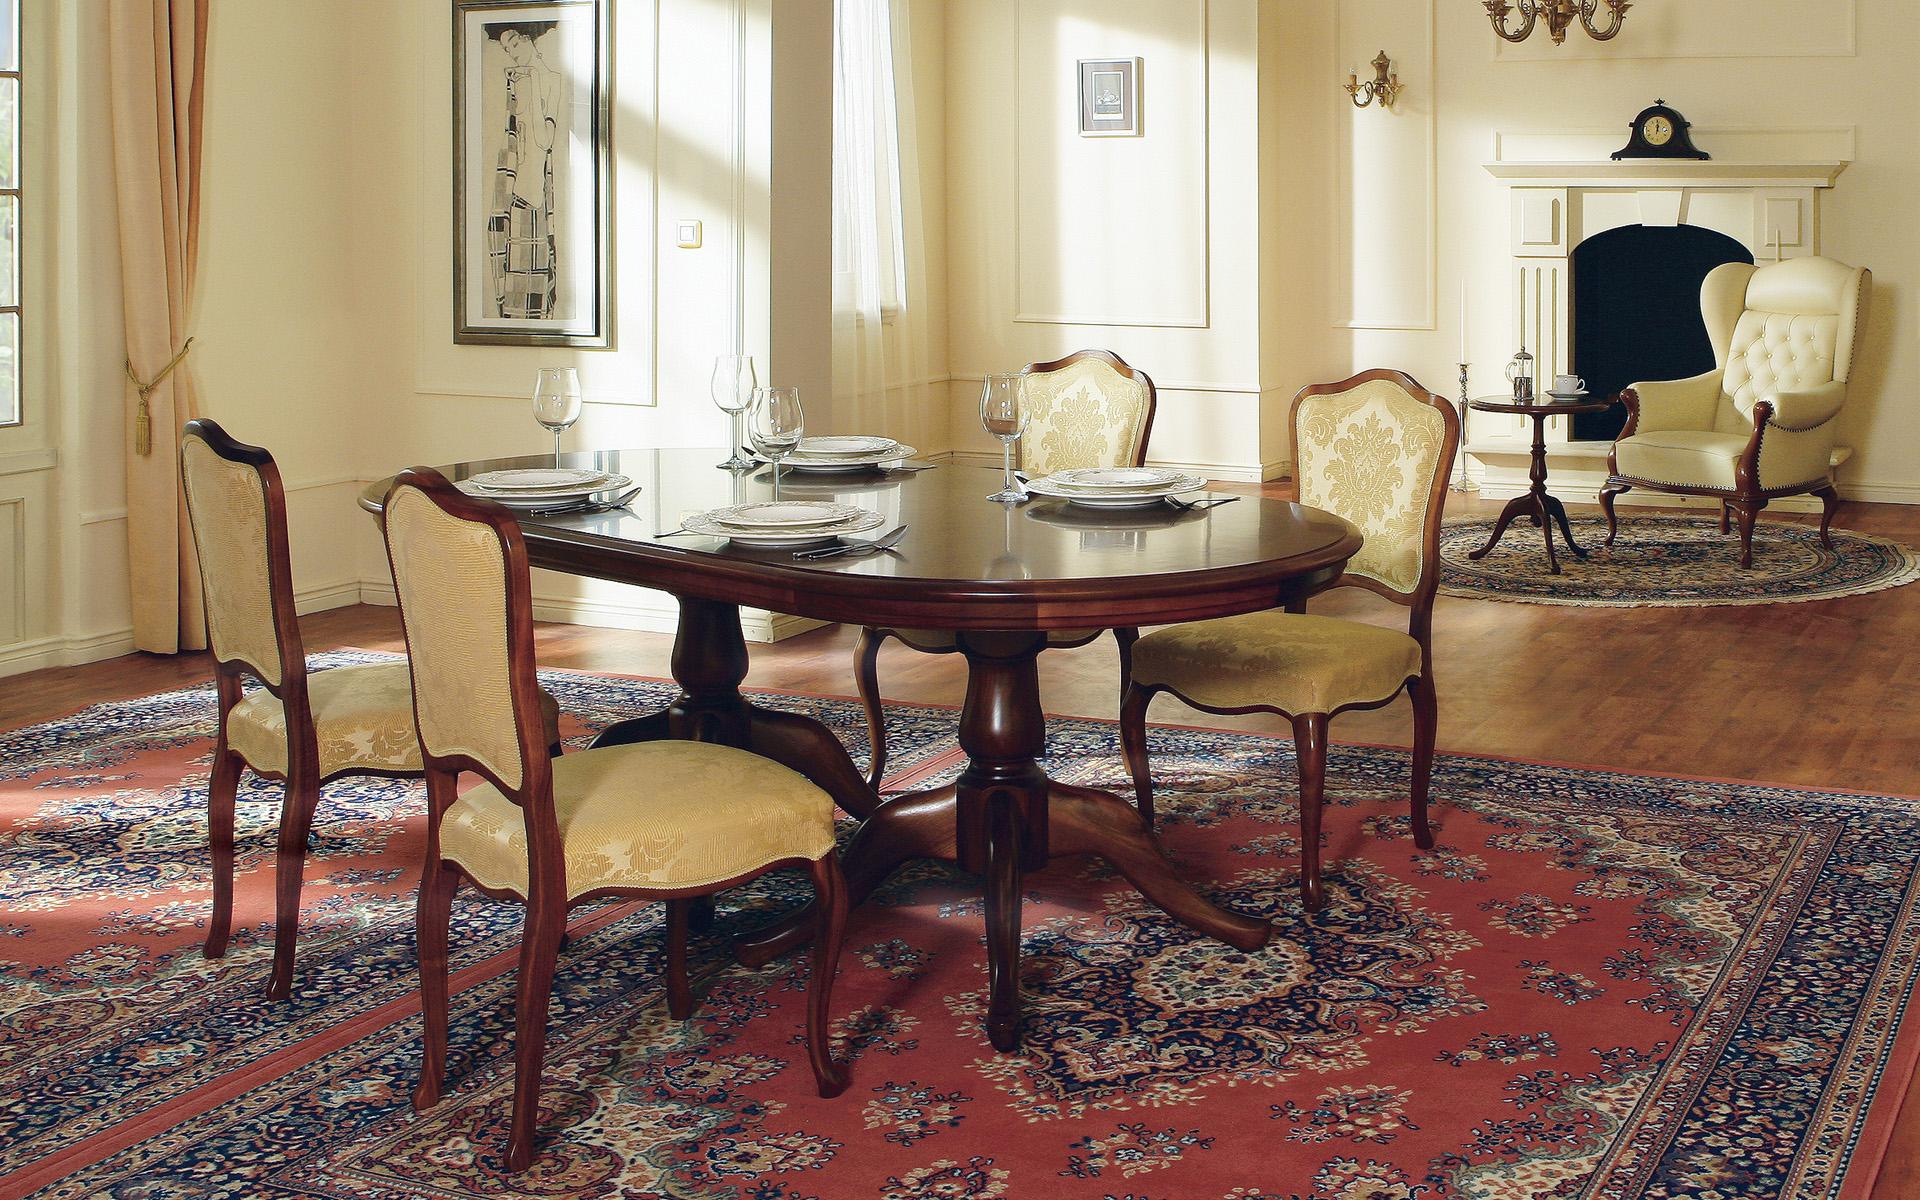 jedilnica_Esszimmer_dining-room_Barocco_klasicno-pohistvo_classic-furniture_Klassischen-Moebel_1